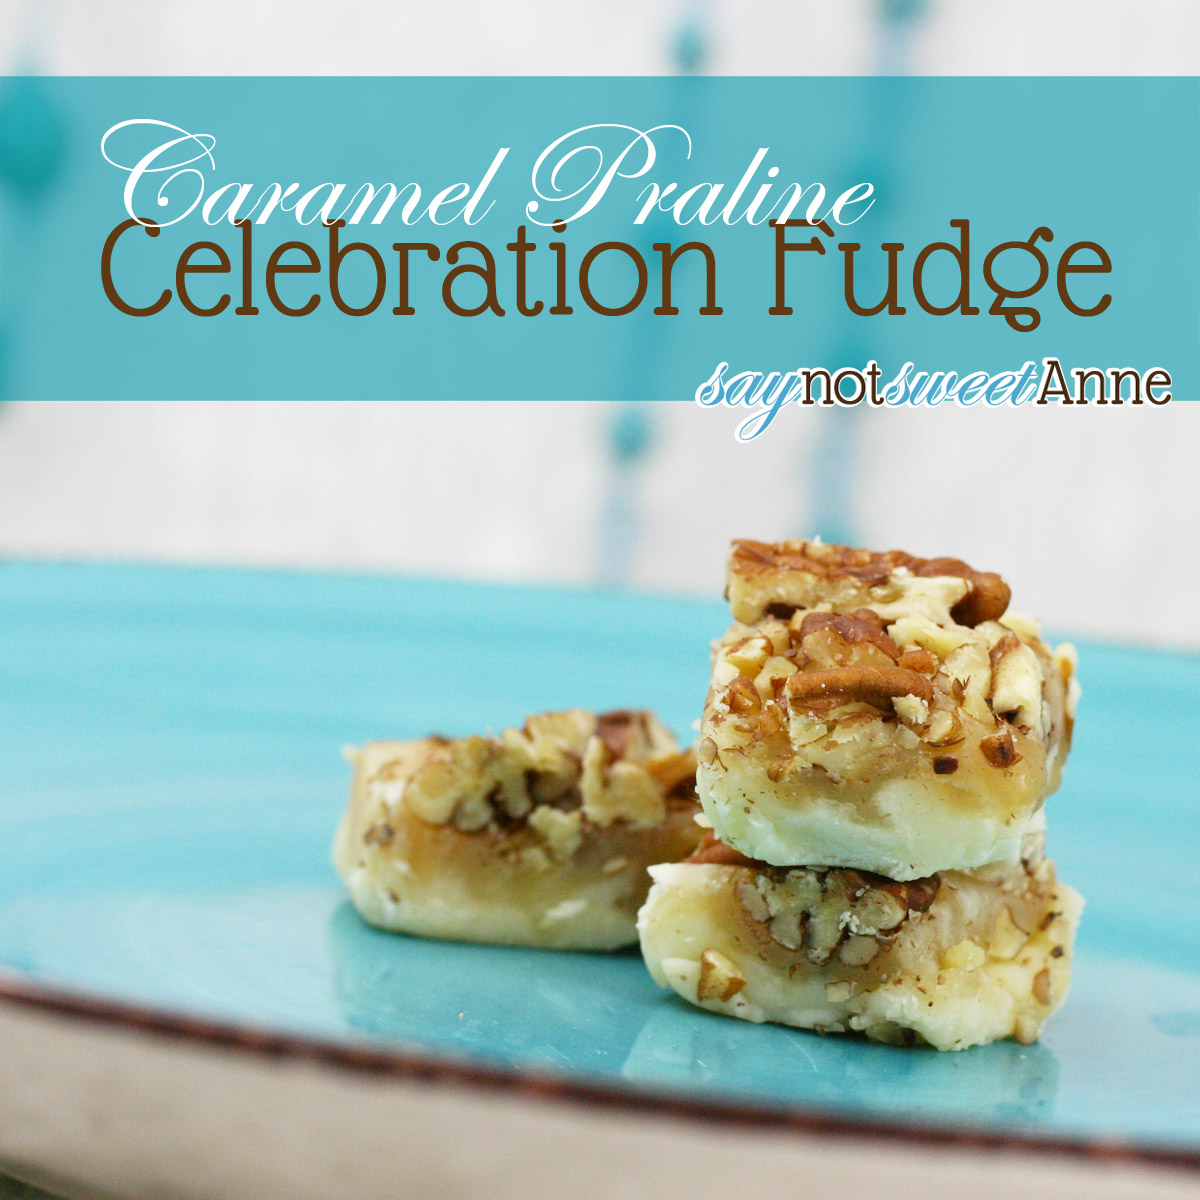 Caramel Praline Celebration Fudge at SayNotSweetAnne.com